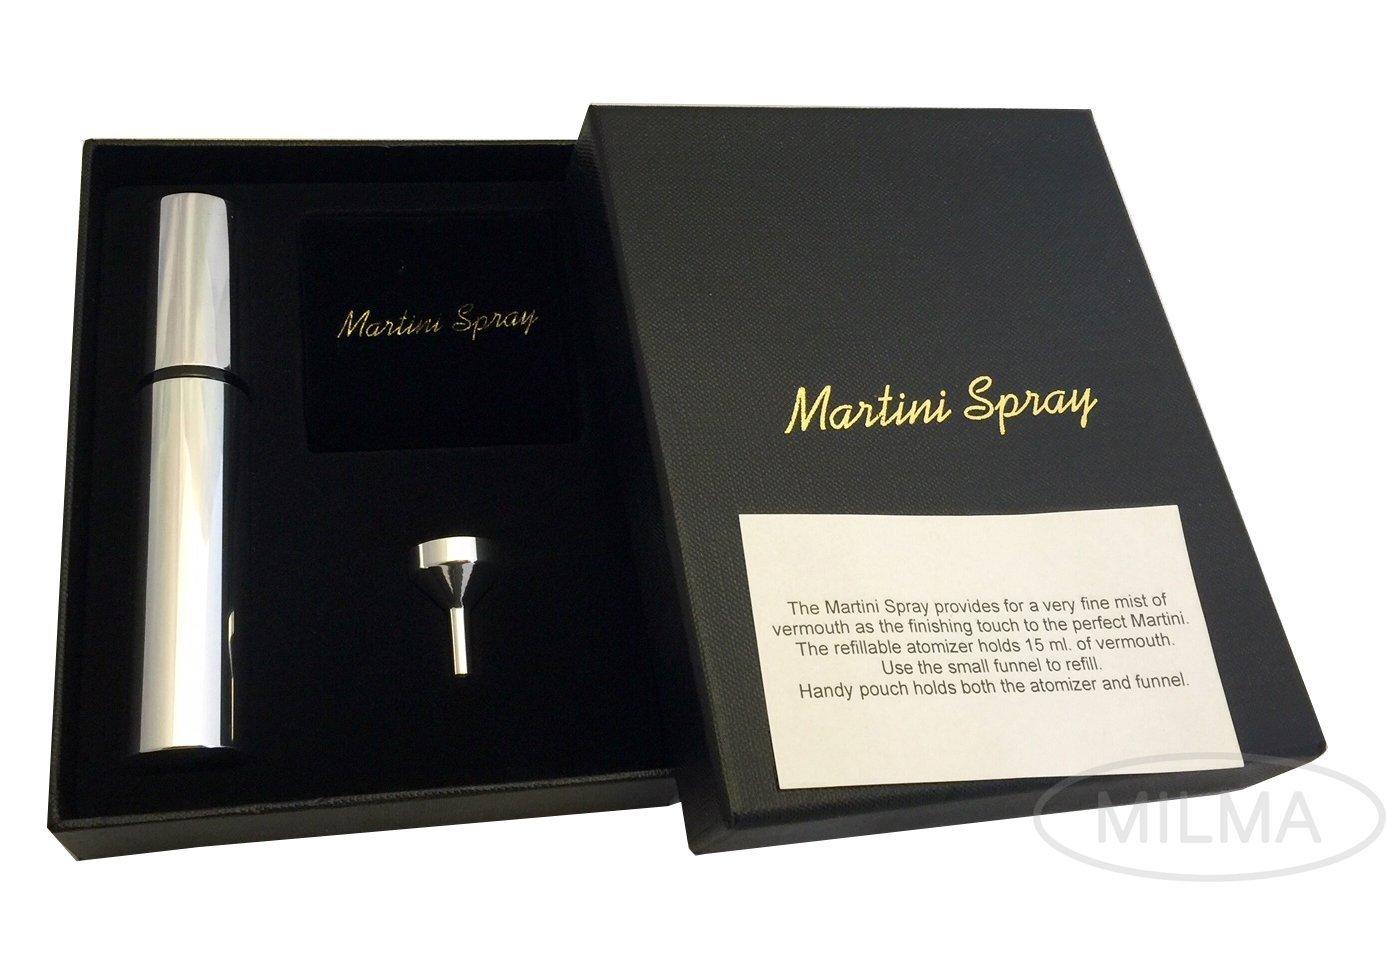 Franmara Martini Atomizer Gift Set, SS Martini Mister, Dry Martini Vermouth Spray Sprayer